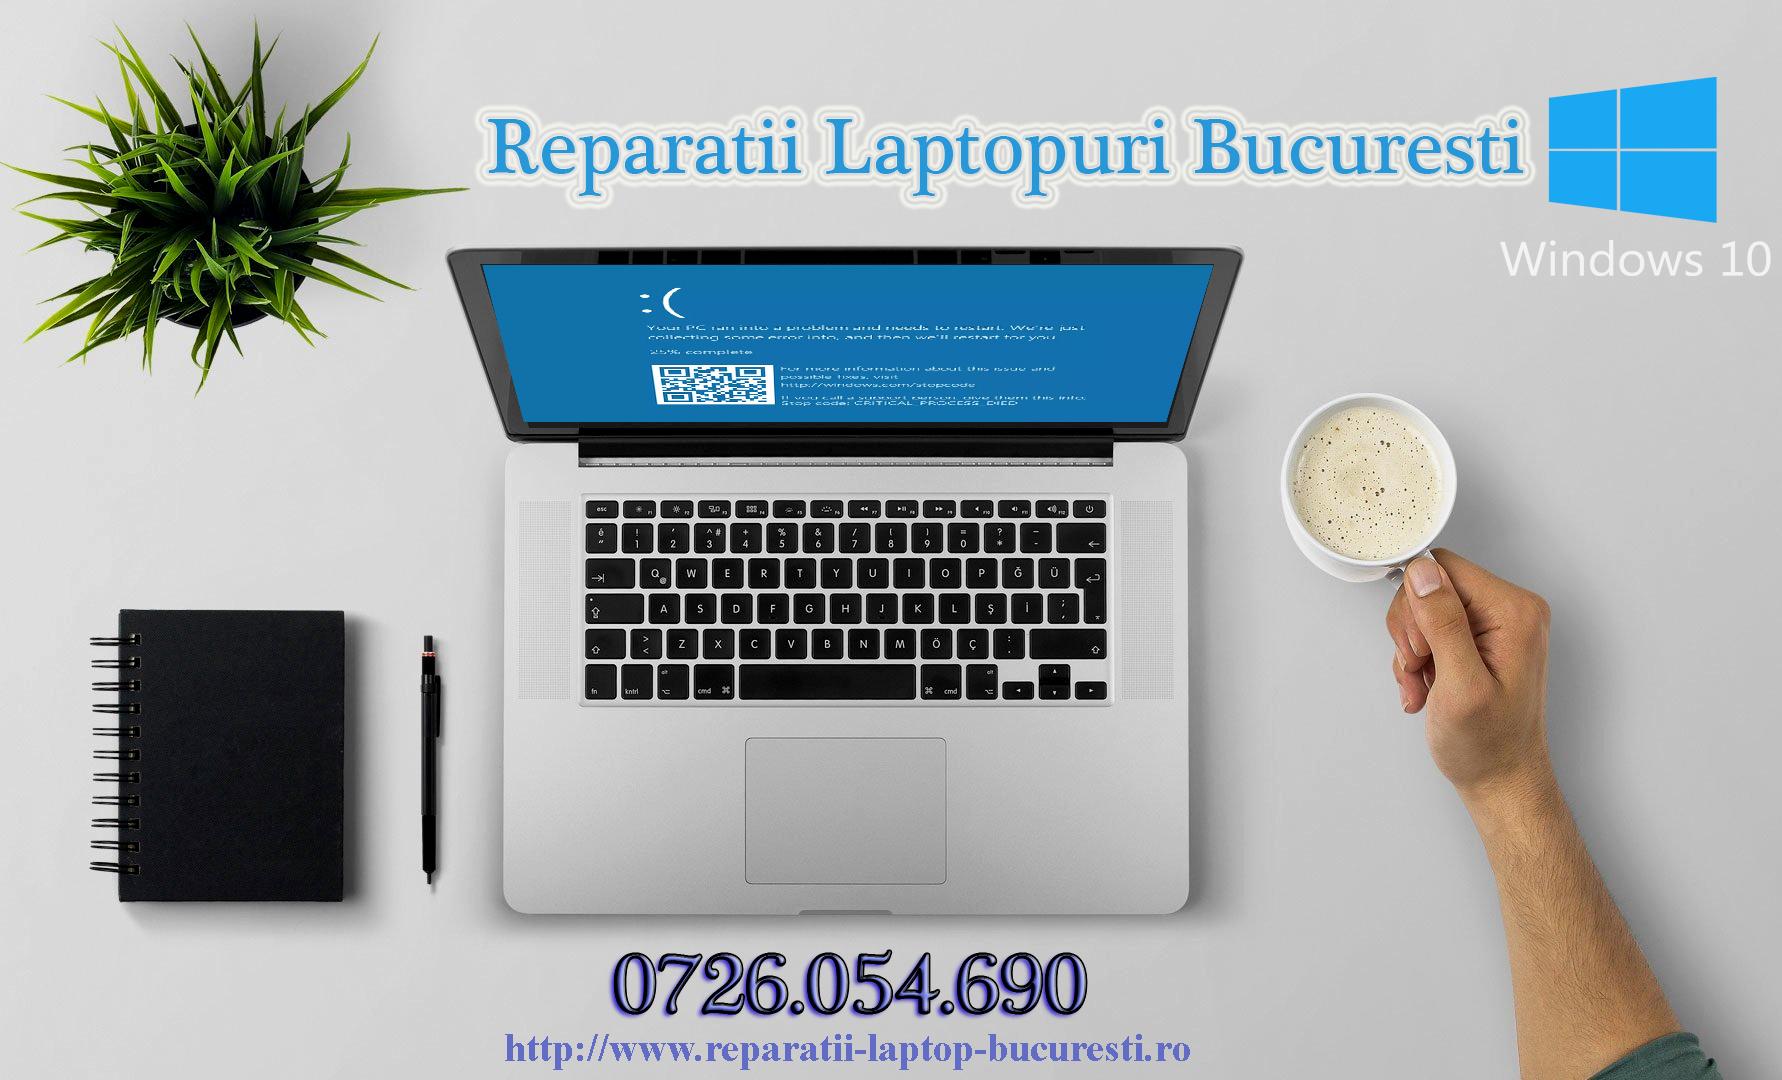 REPARATII LAPTOPURI BUCURESTI REPARATII CALCULATOARE BUCURESTI REPARATII MONITOARE LCD B